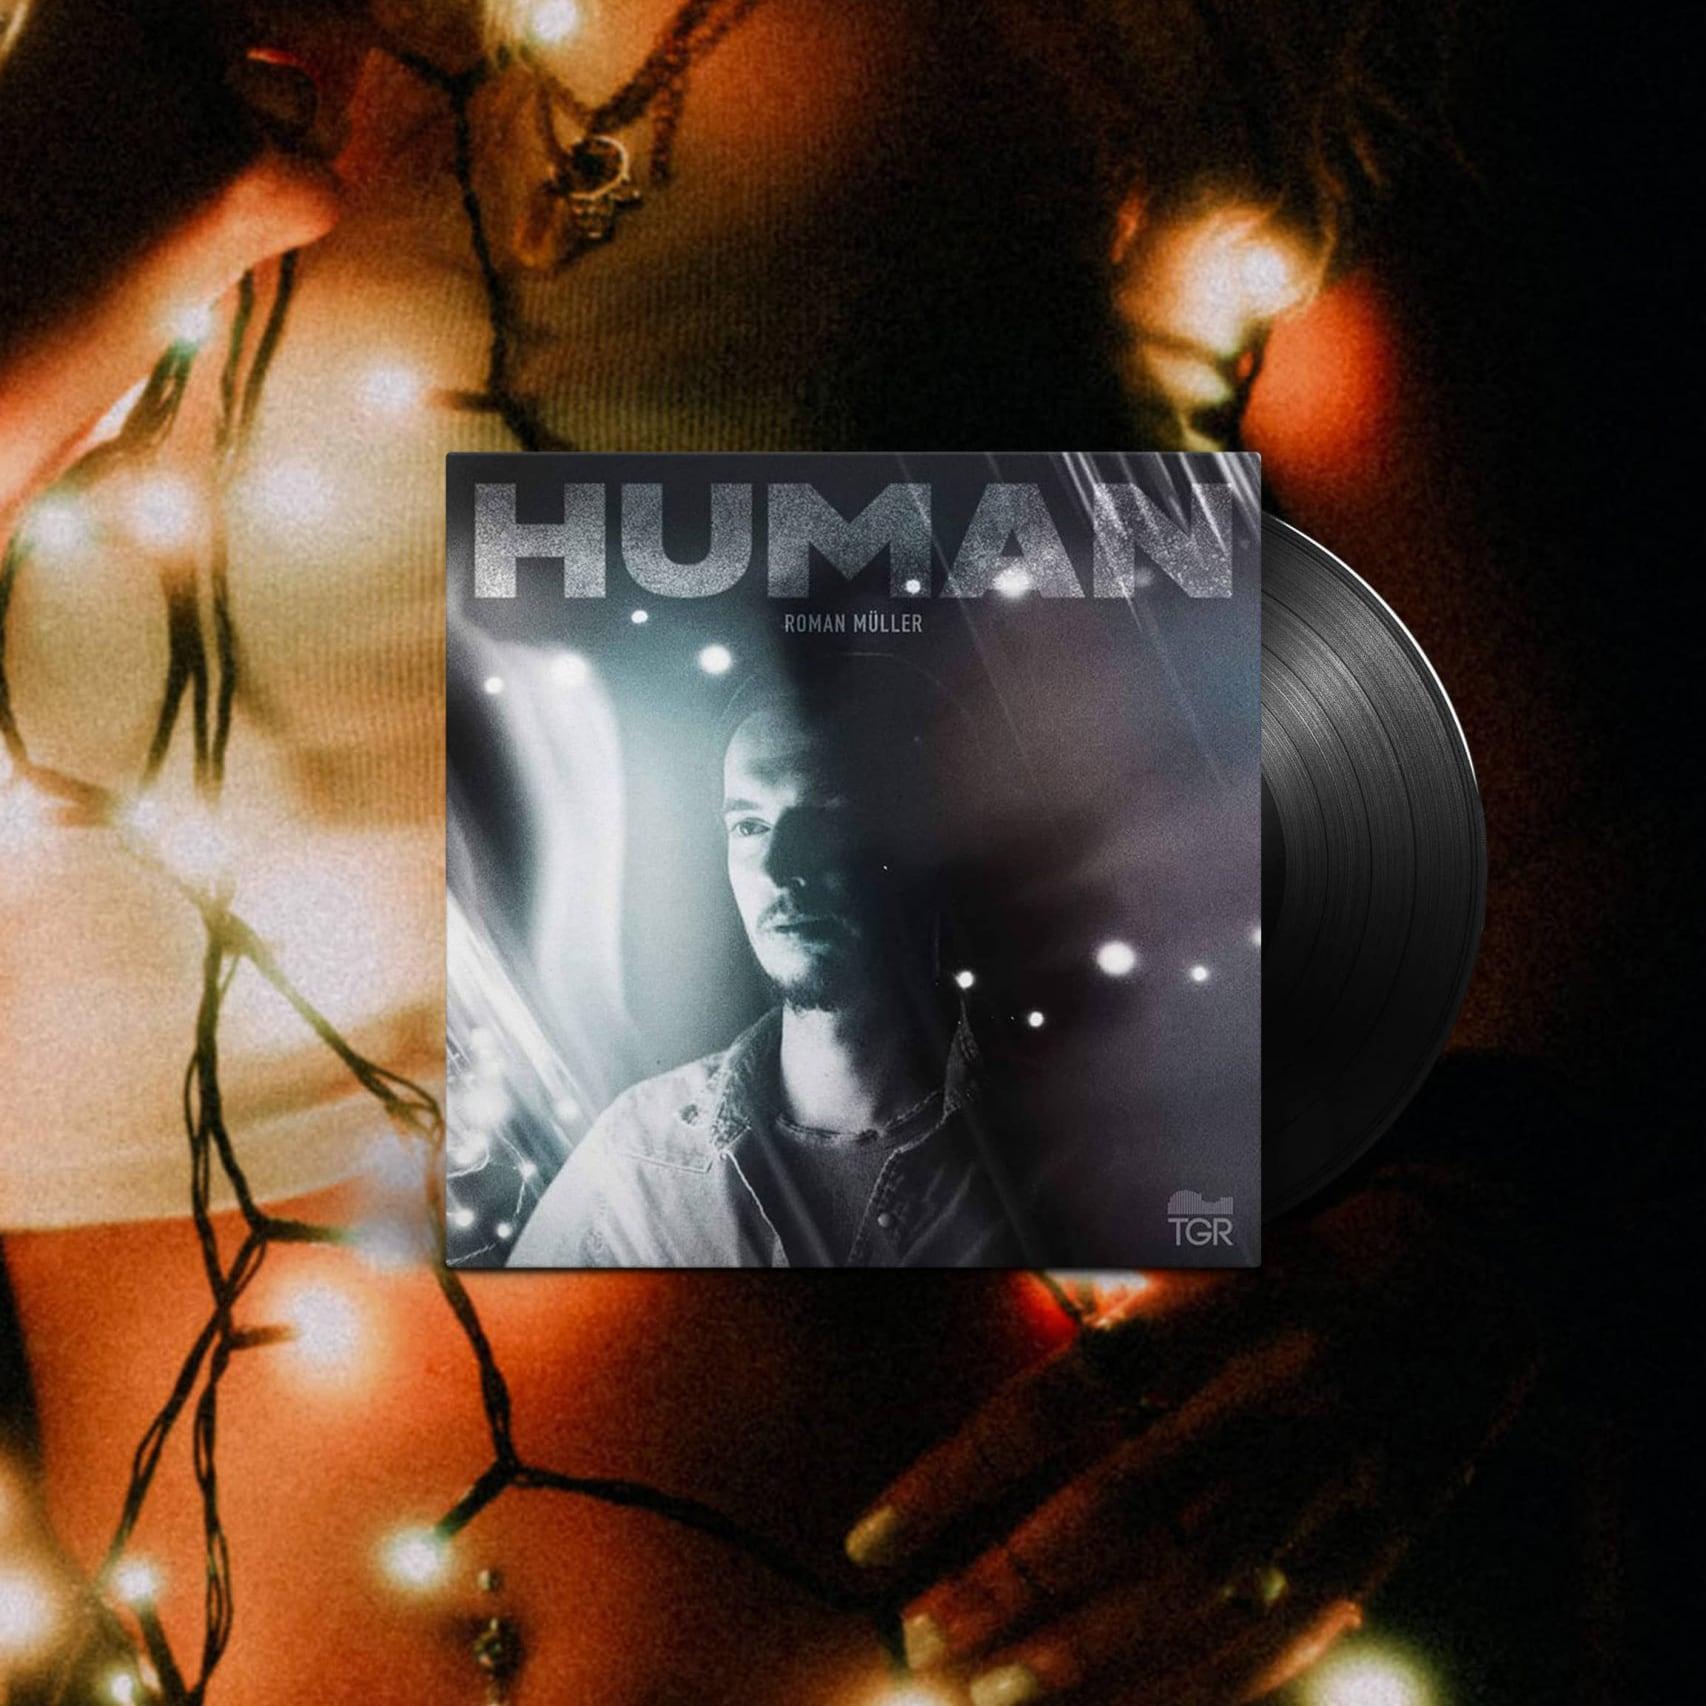 Roman Müller / Musikvideo